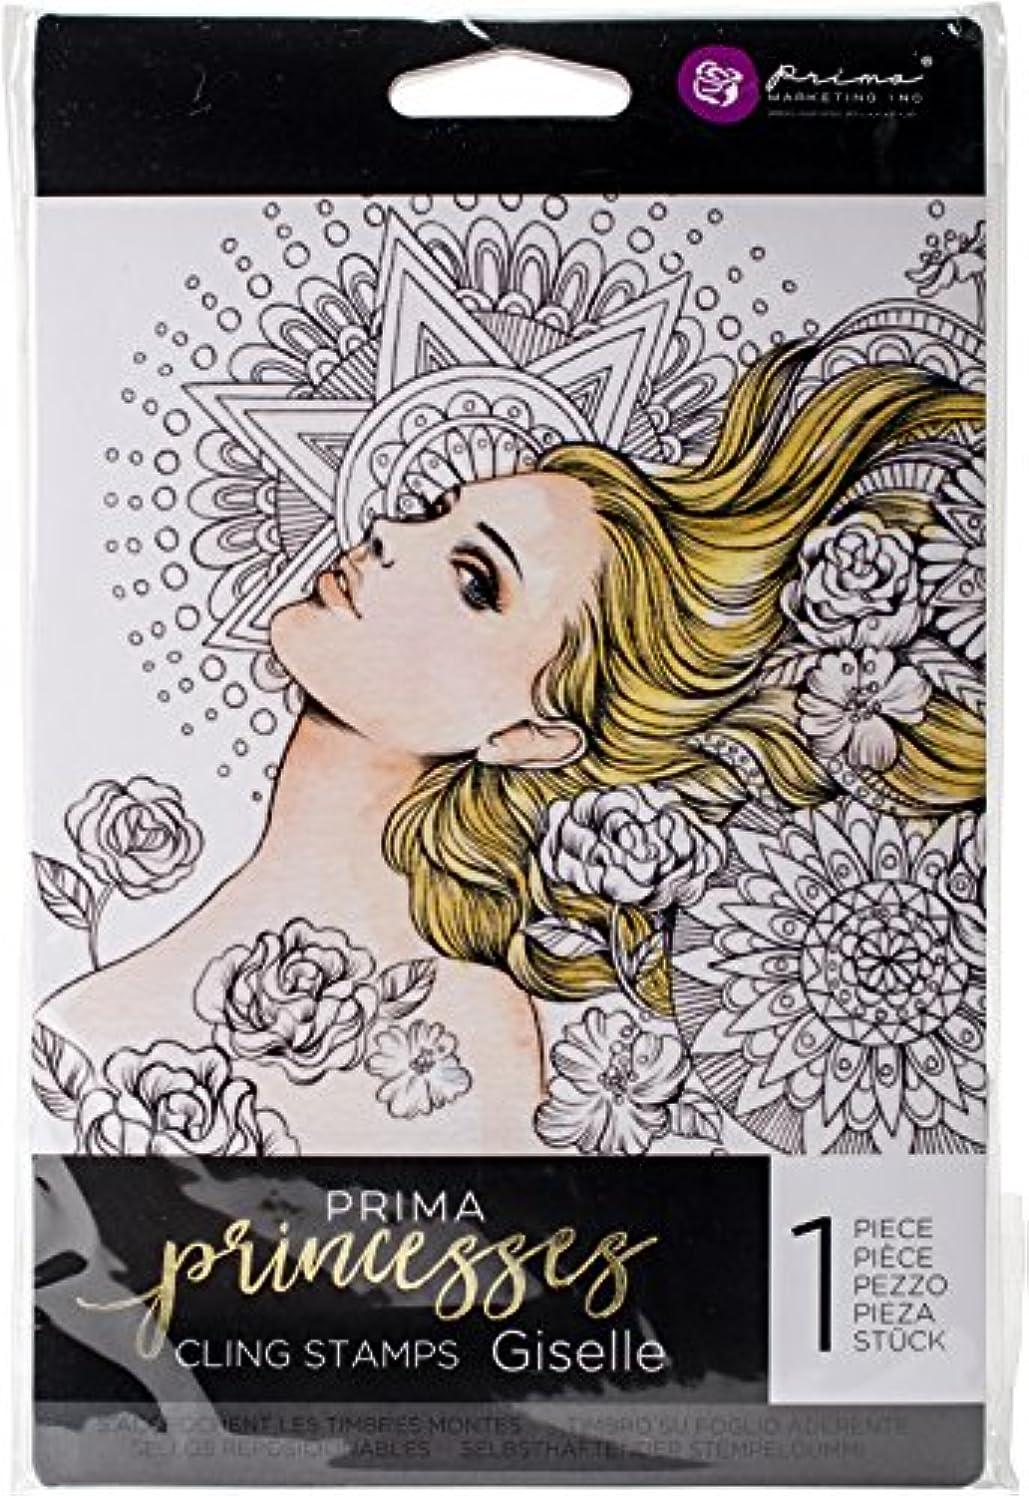 Prima Marketing Prima Princess Stamp - Giselle